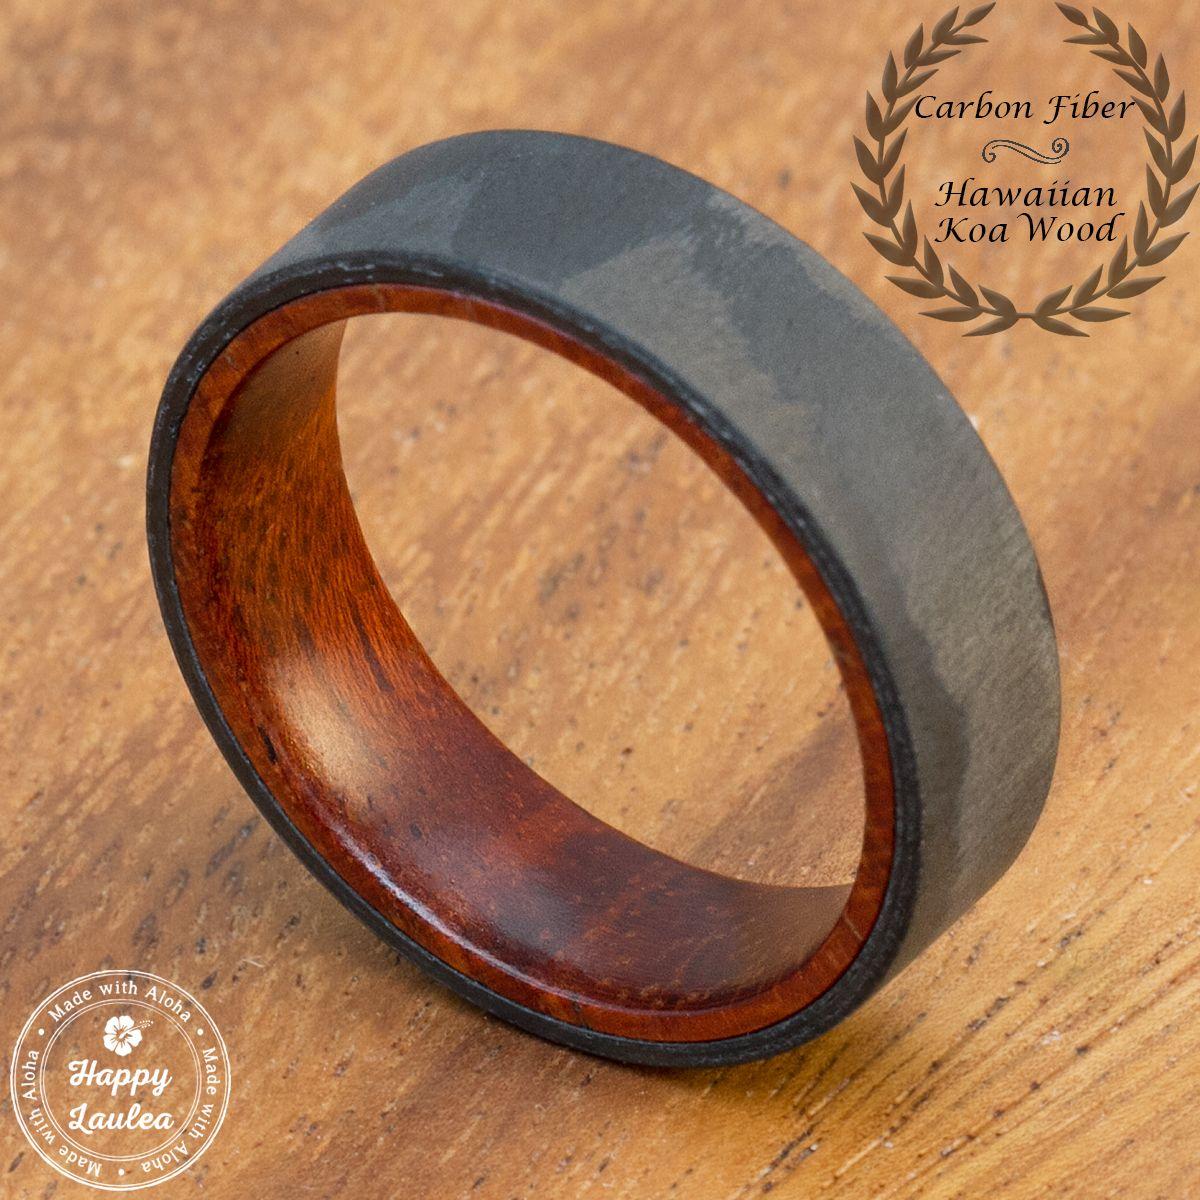 Buy A Custom Carbon Fiber Ring With Inside Hawaiian Koa